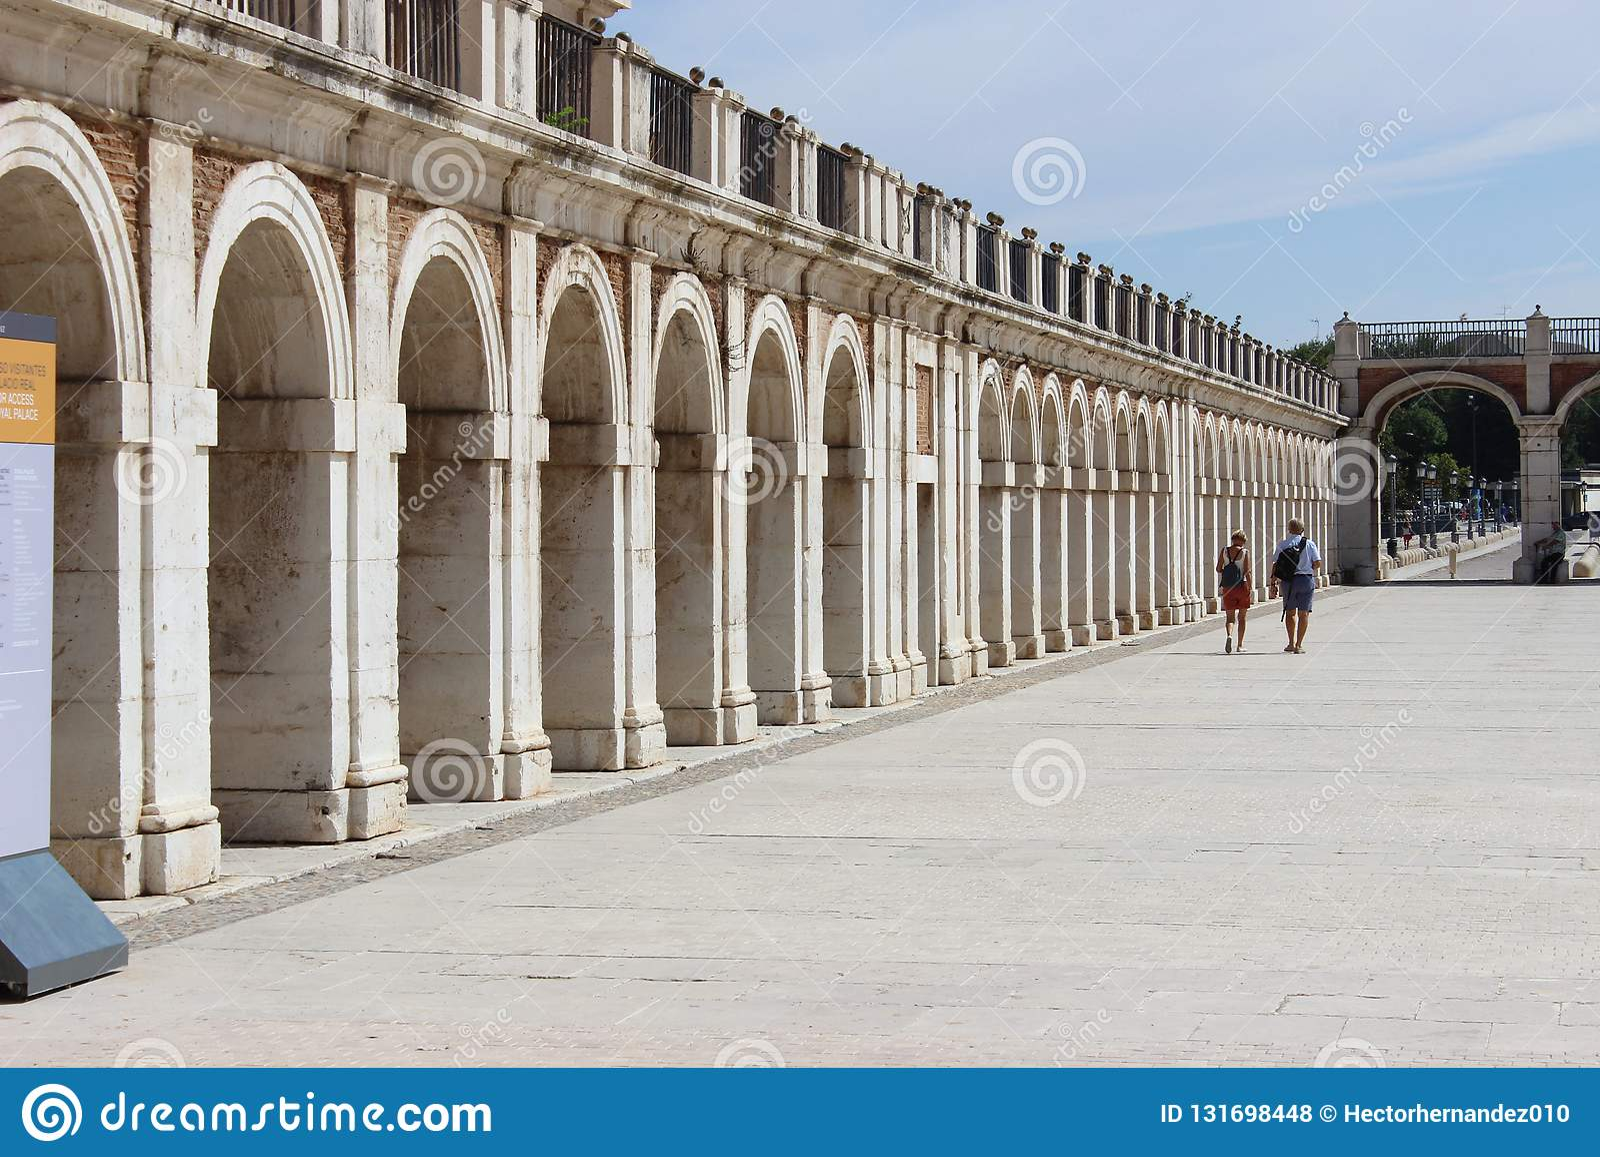 Arché di pietra a Aranjuez, Spagna